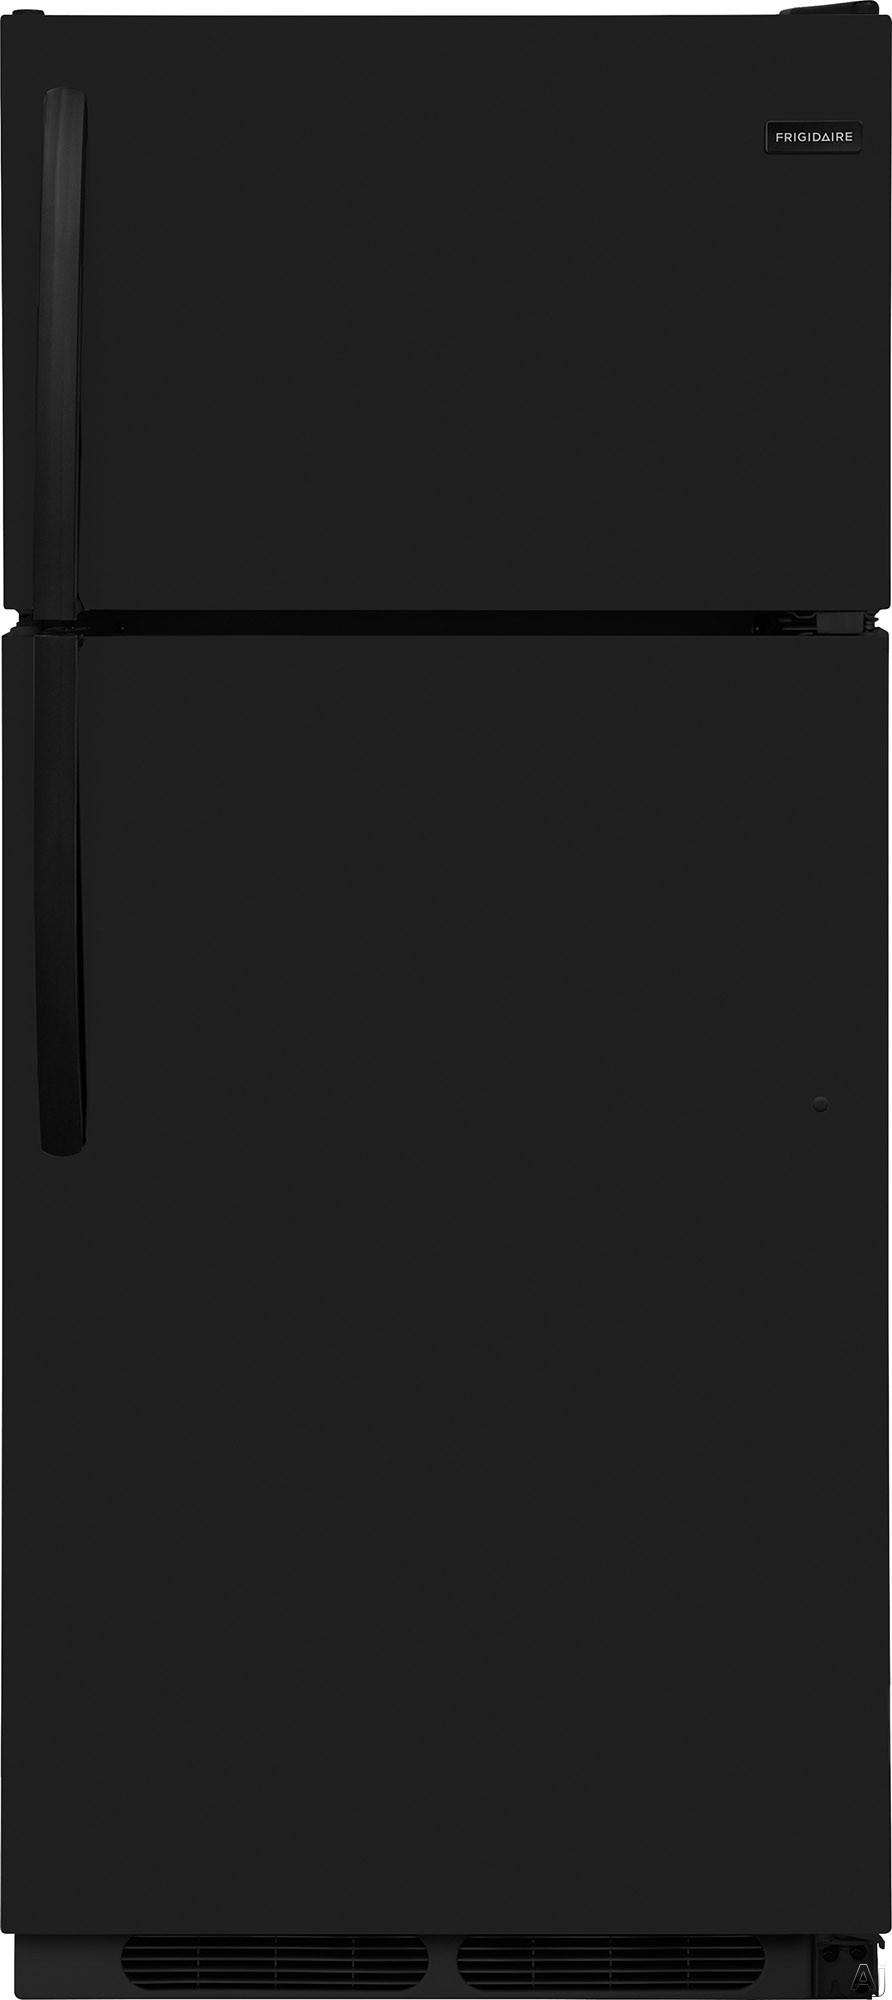 "Frigidaire FFHT1614T 28 Inch Top-Freezer Refrigerator with Store-Moreâ""¢ Crispers, Store-Moreâ""¢ Gallon Shelf, Reversible Door, Clear Dairy Bin, Full Width Freezer Shelf, ADA Compliant and Energy Star"